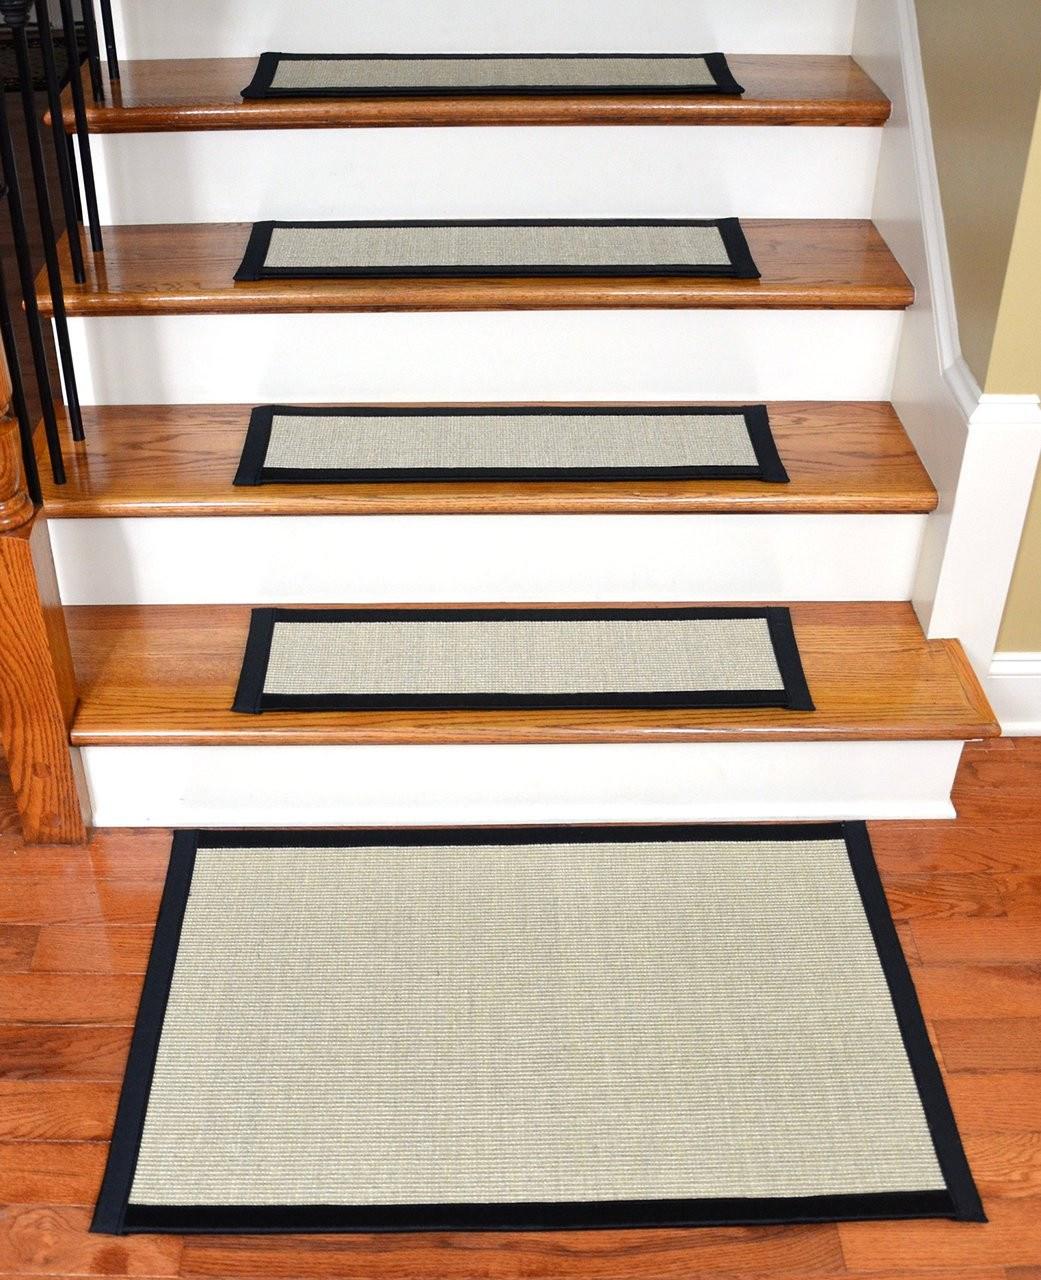 Sisal Stair Treads With Matching Landing Mat 29 X 9 | Carpet Landing Wooden Stairs | Patterned | Builder Grade | Light Wood | Red Oak Wood | Hardwood